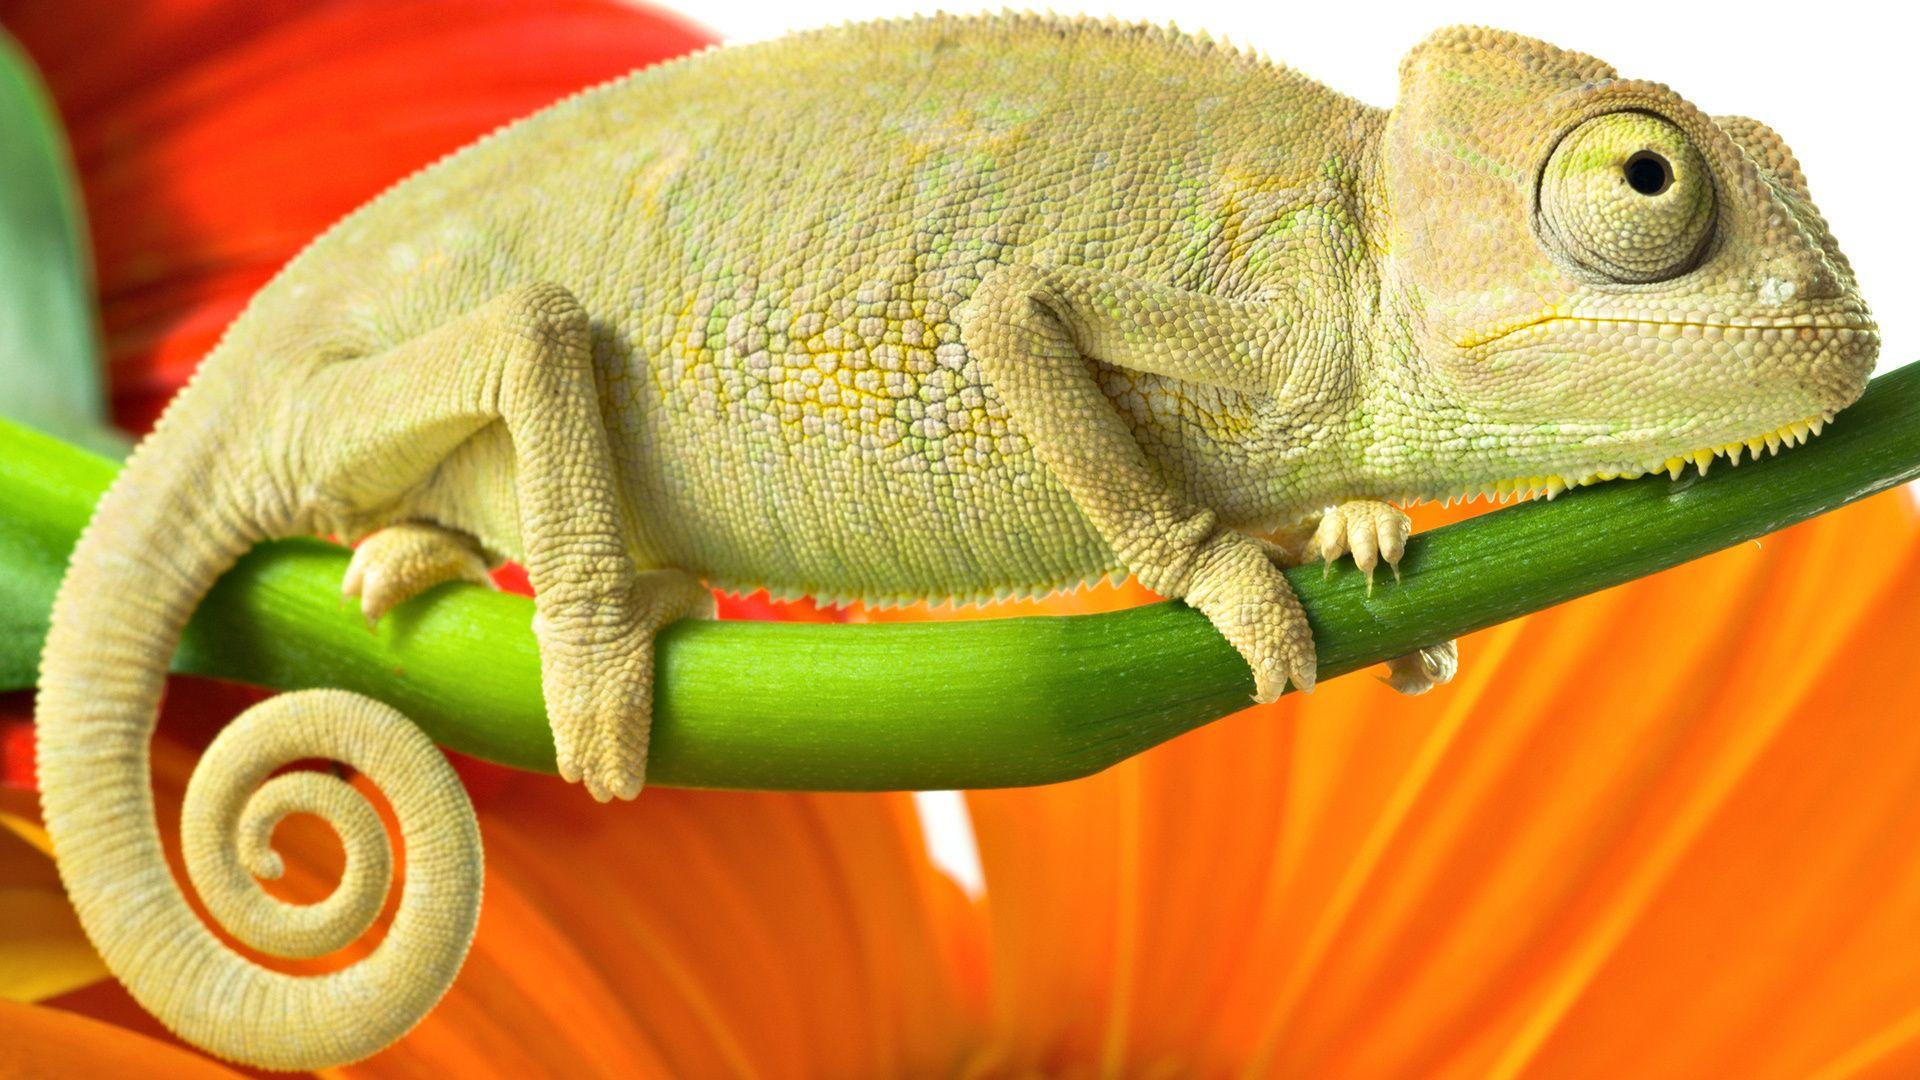 Reptiles Chameleon